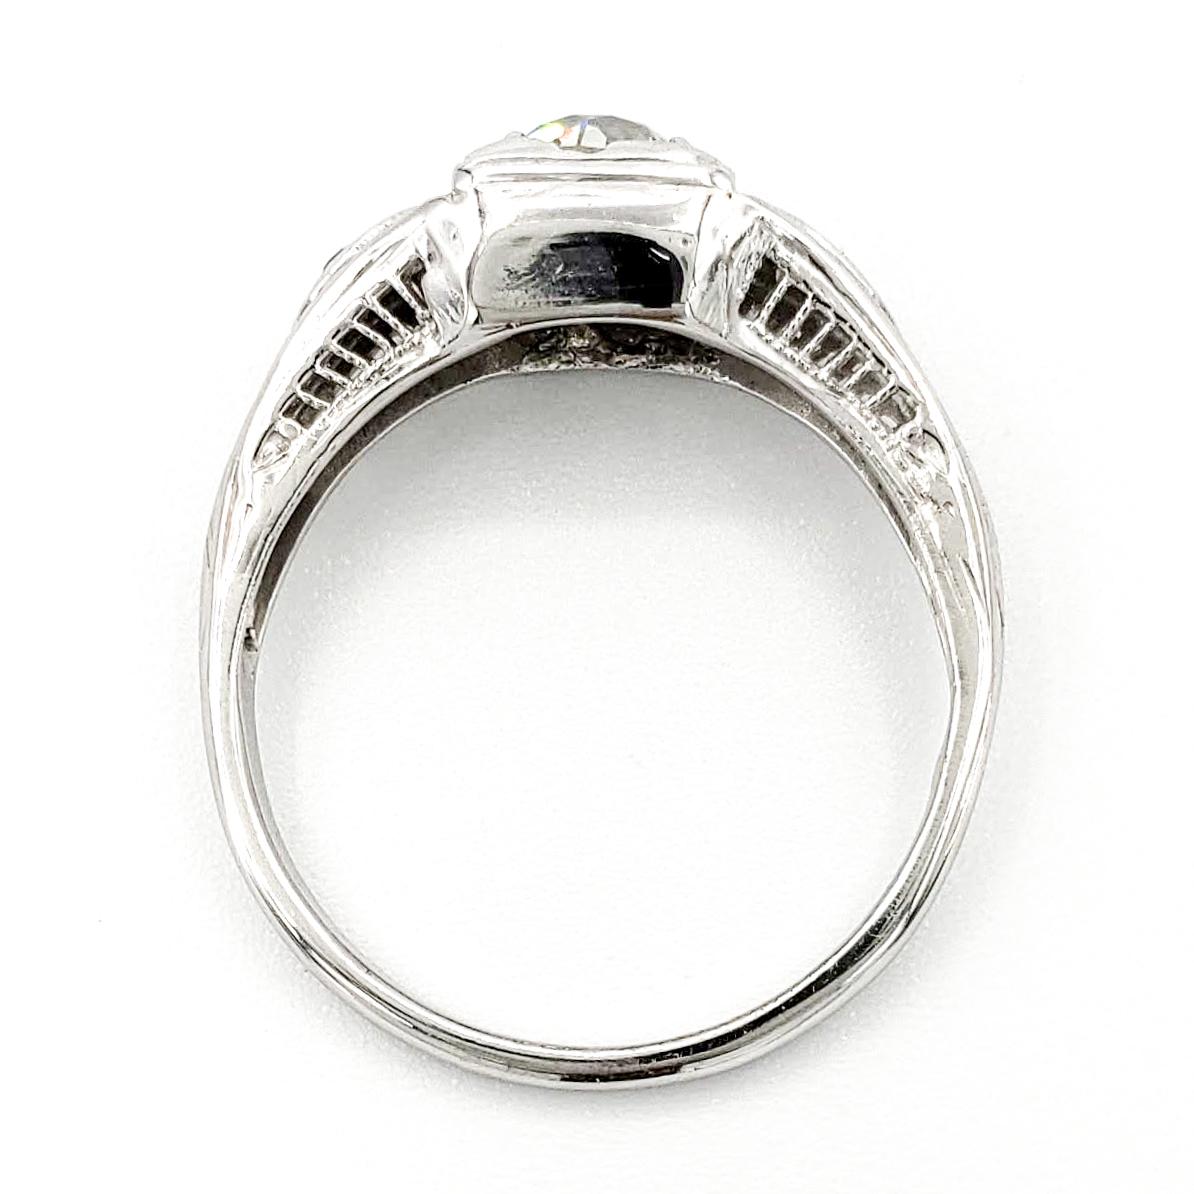 vintage-14-karat-gold-engagement-ring-with-0-69-carat-old-european-cut-diamond-egl-l-vs2